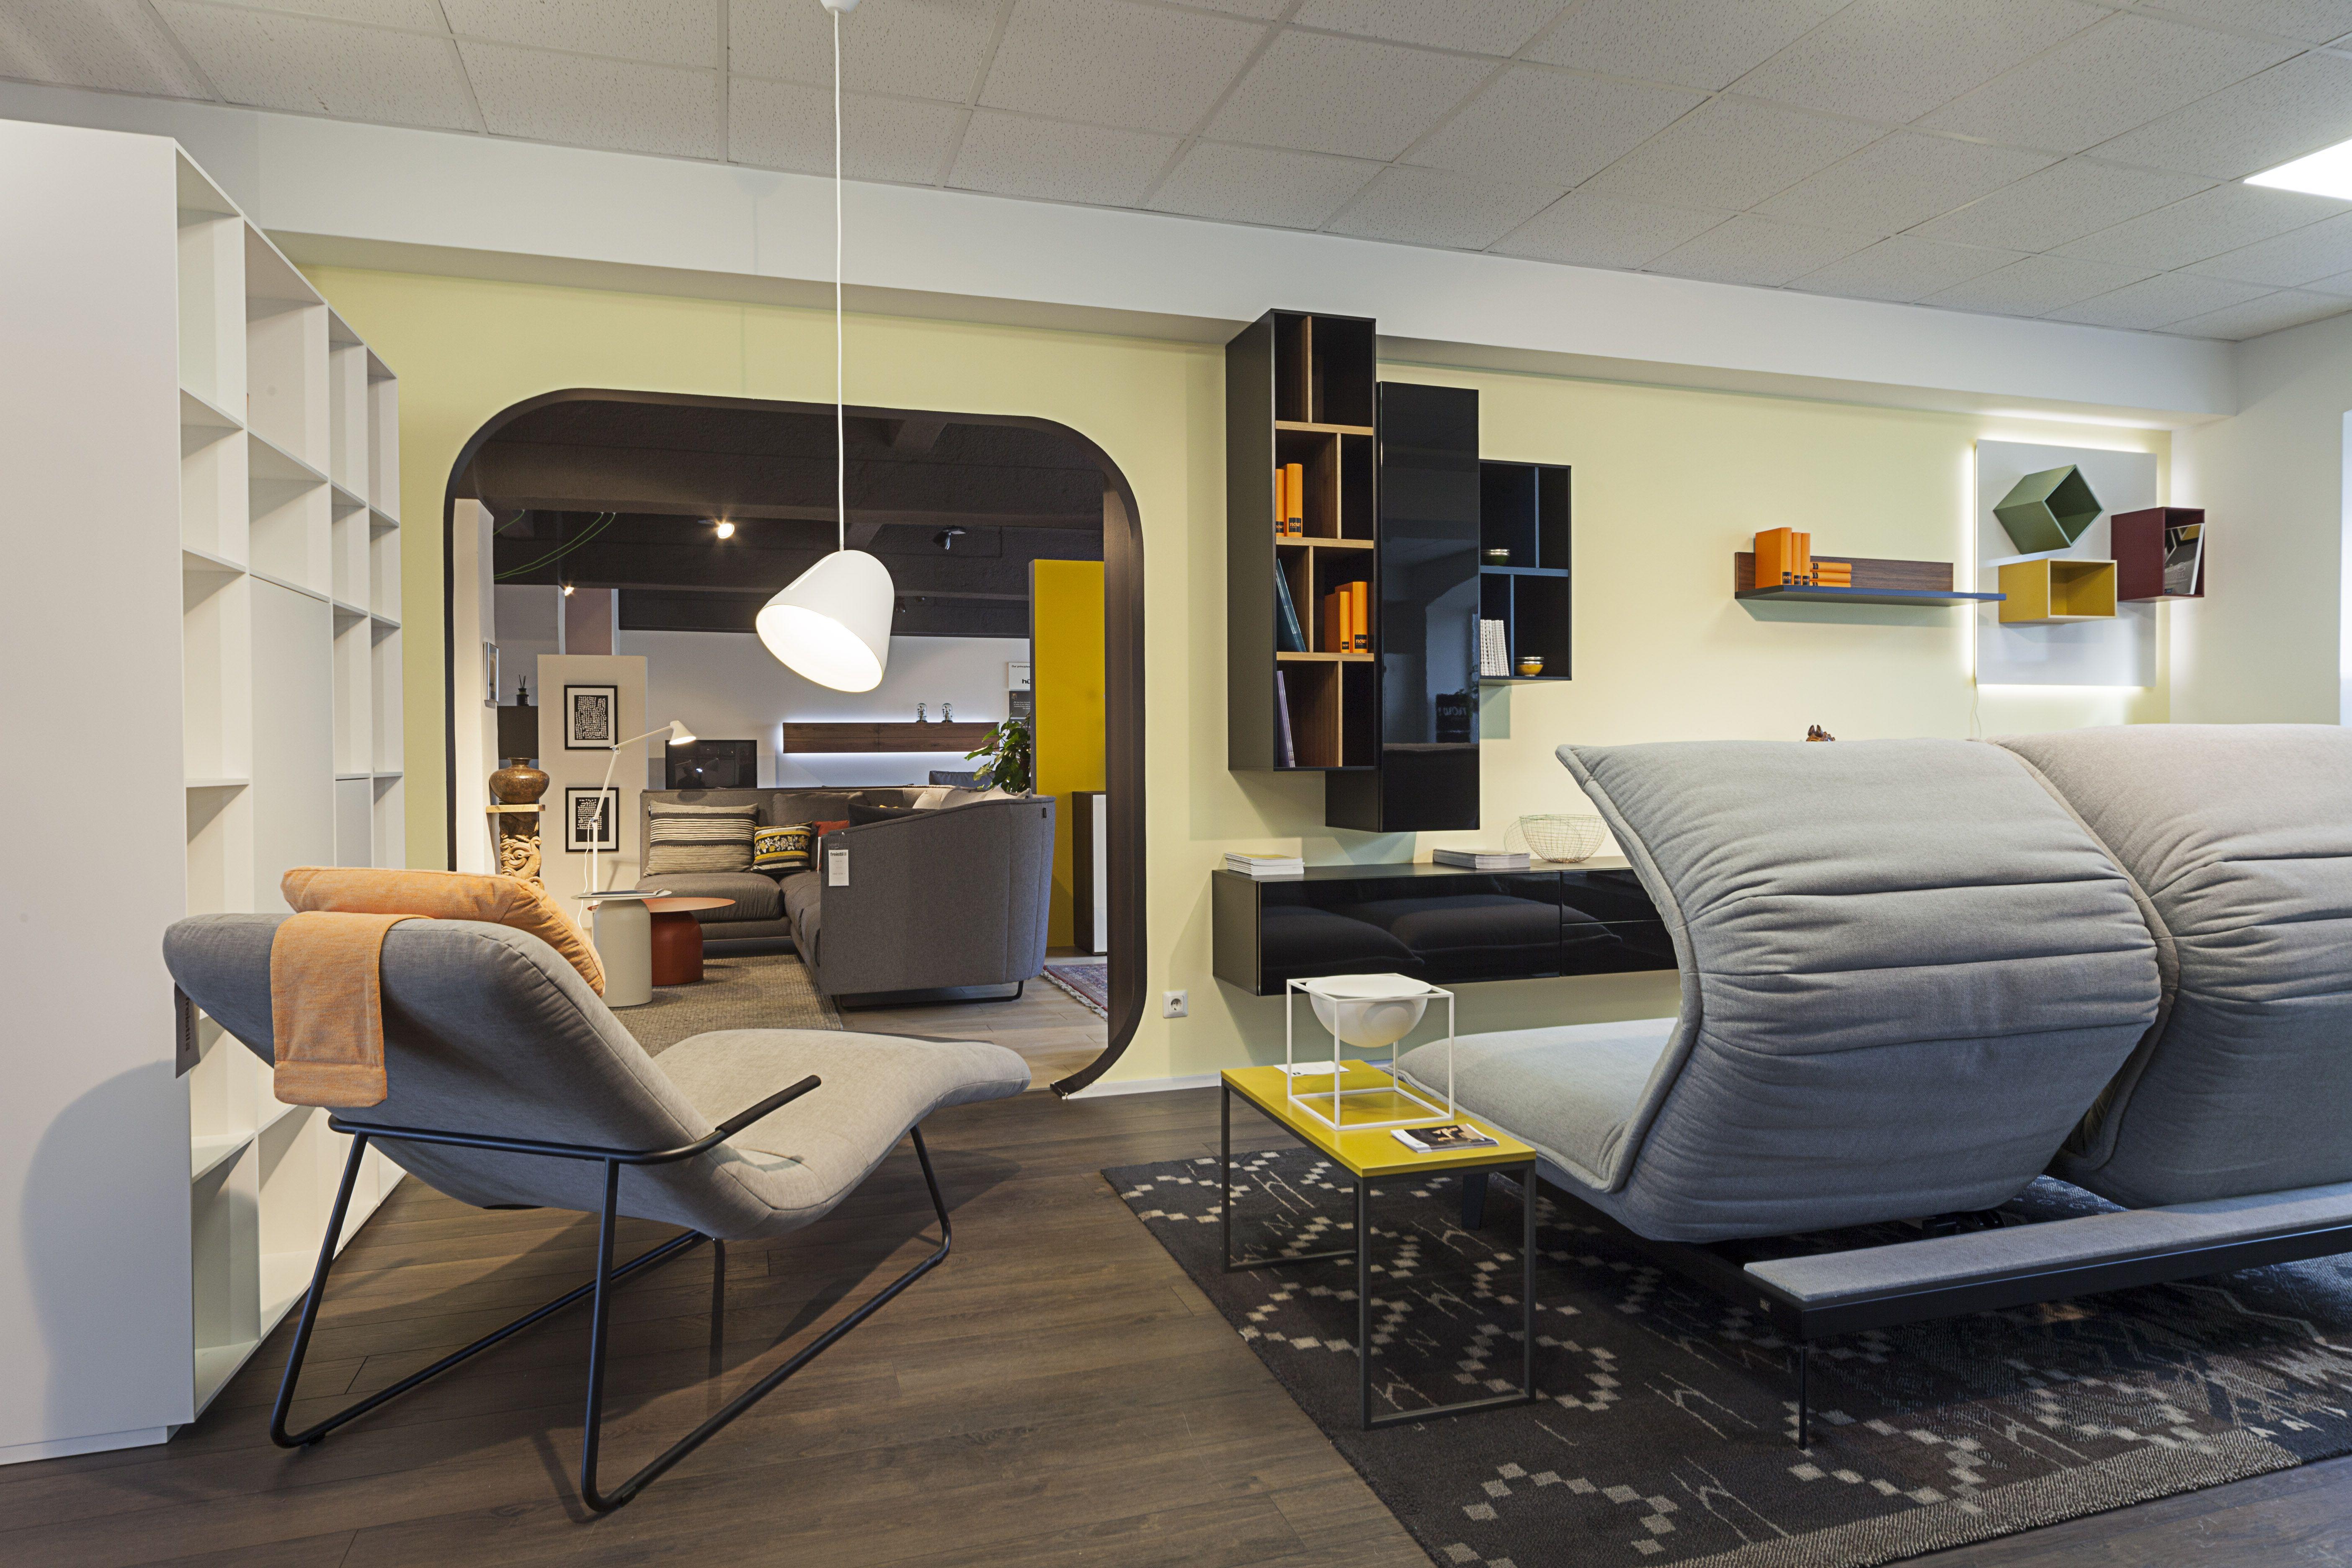 Rolf Benz Nova sofa, Freistil 163, Piure cabinets, Now! by Hülsta Vision cabinets